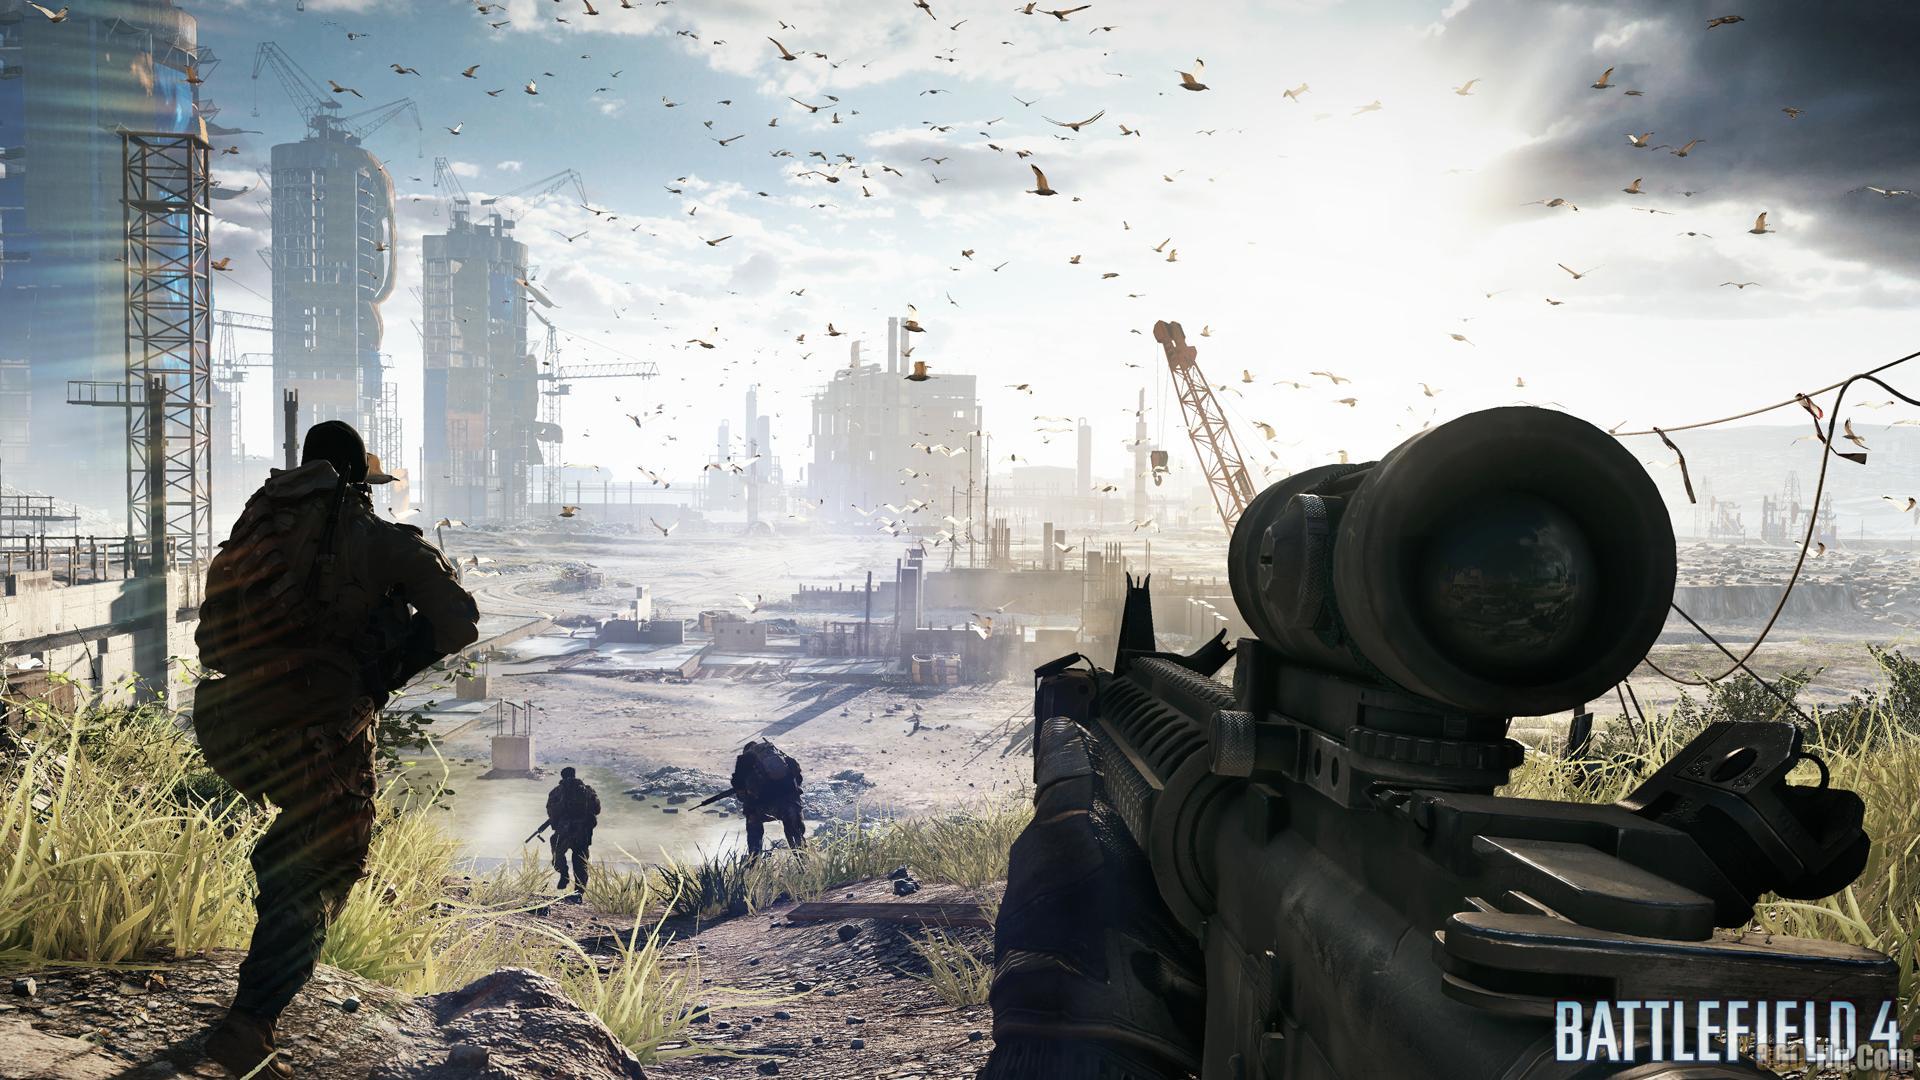 Battlefield 4 Xbox 360 Screenshot 27502